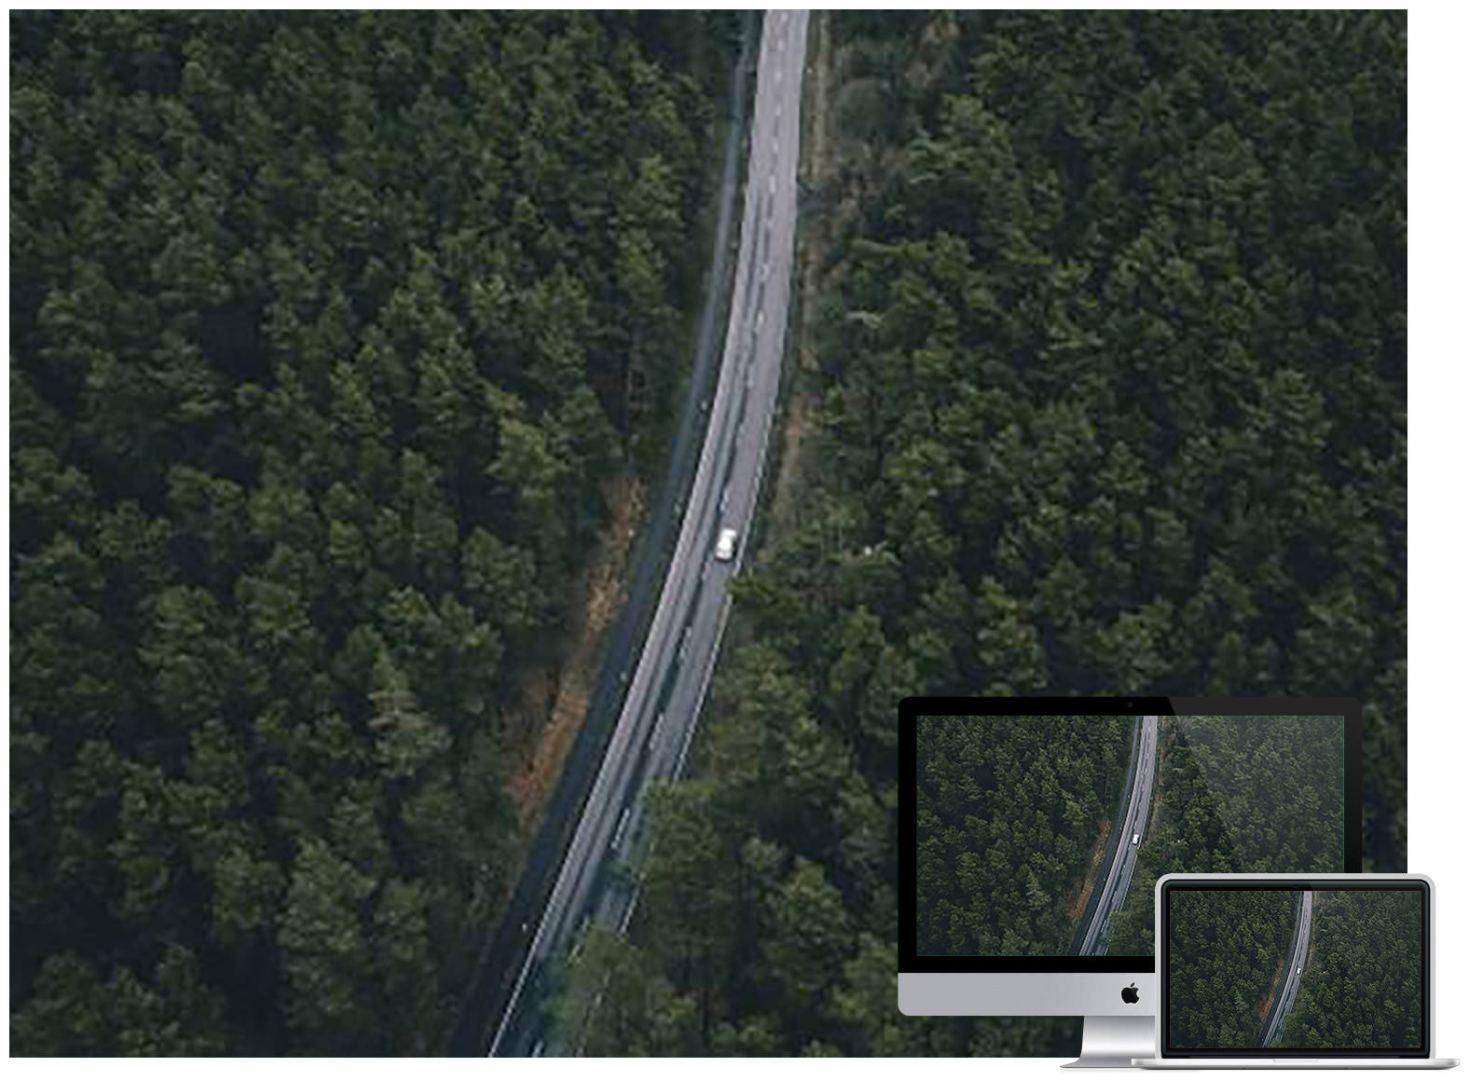 road-trees-top-view-wallpaper